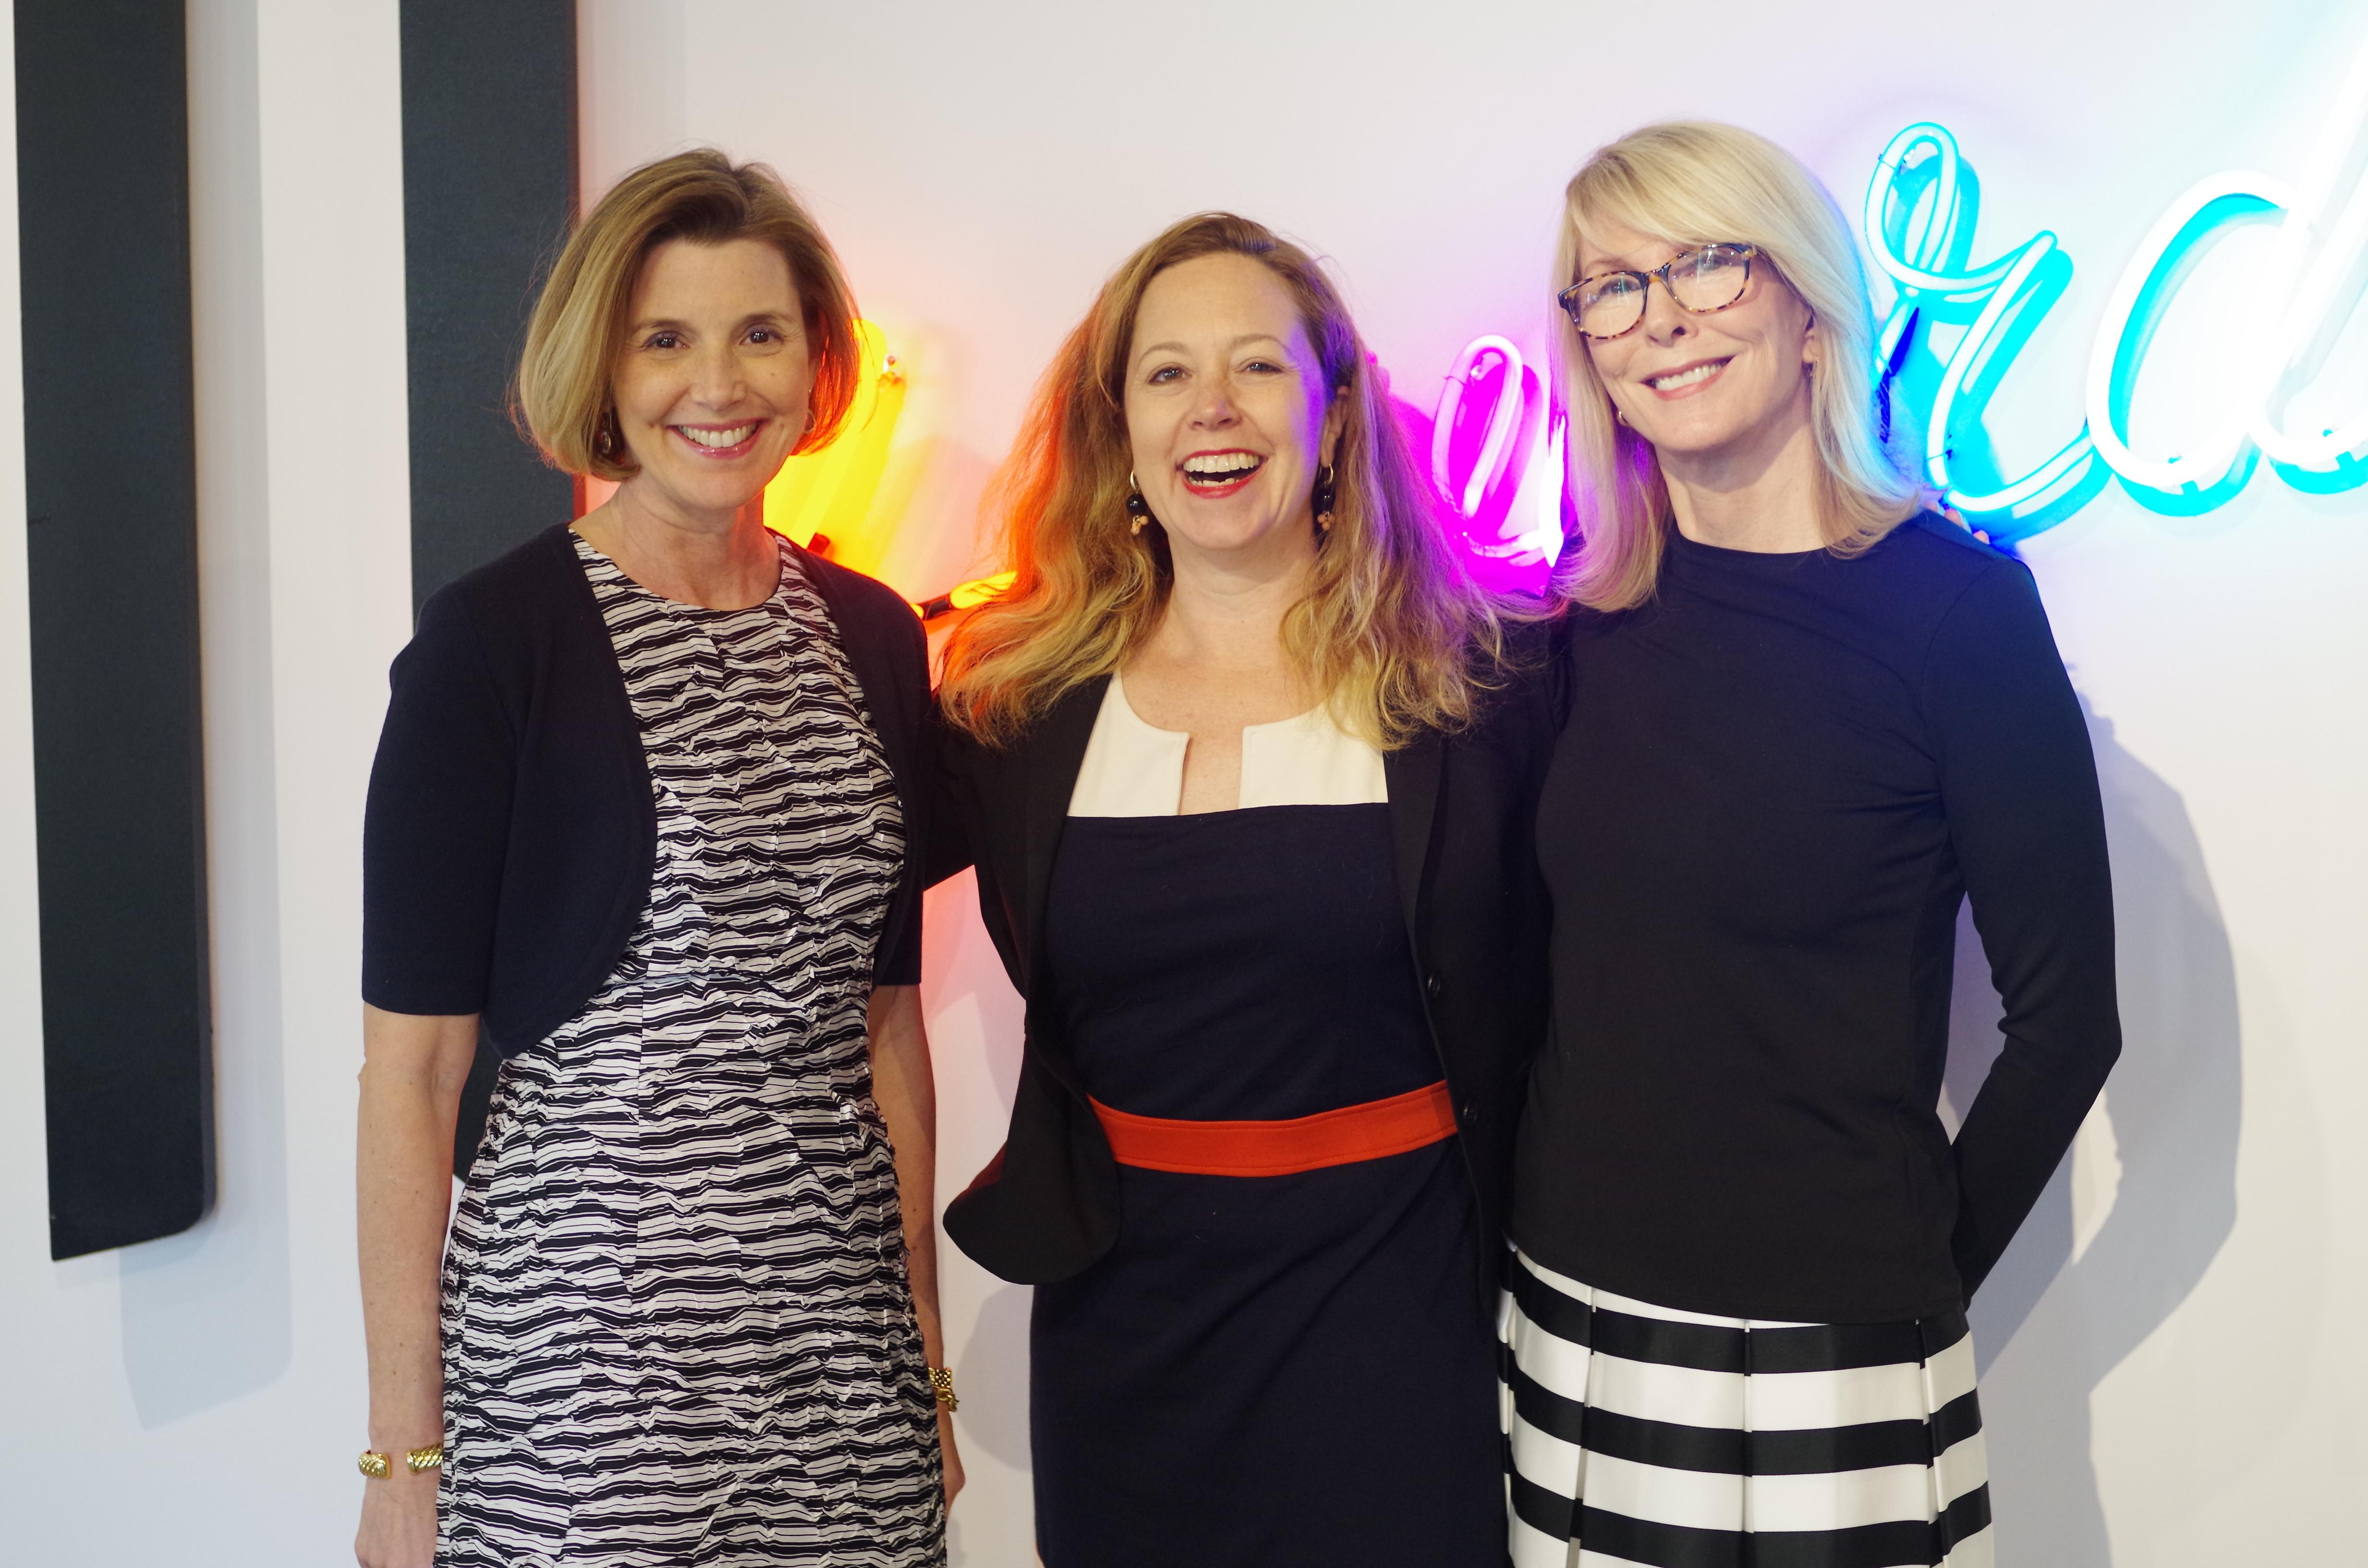 Sallie Krawcheck, Jennifer Reingold, and Susan Lyne at STORY, March, 2016